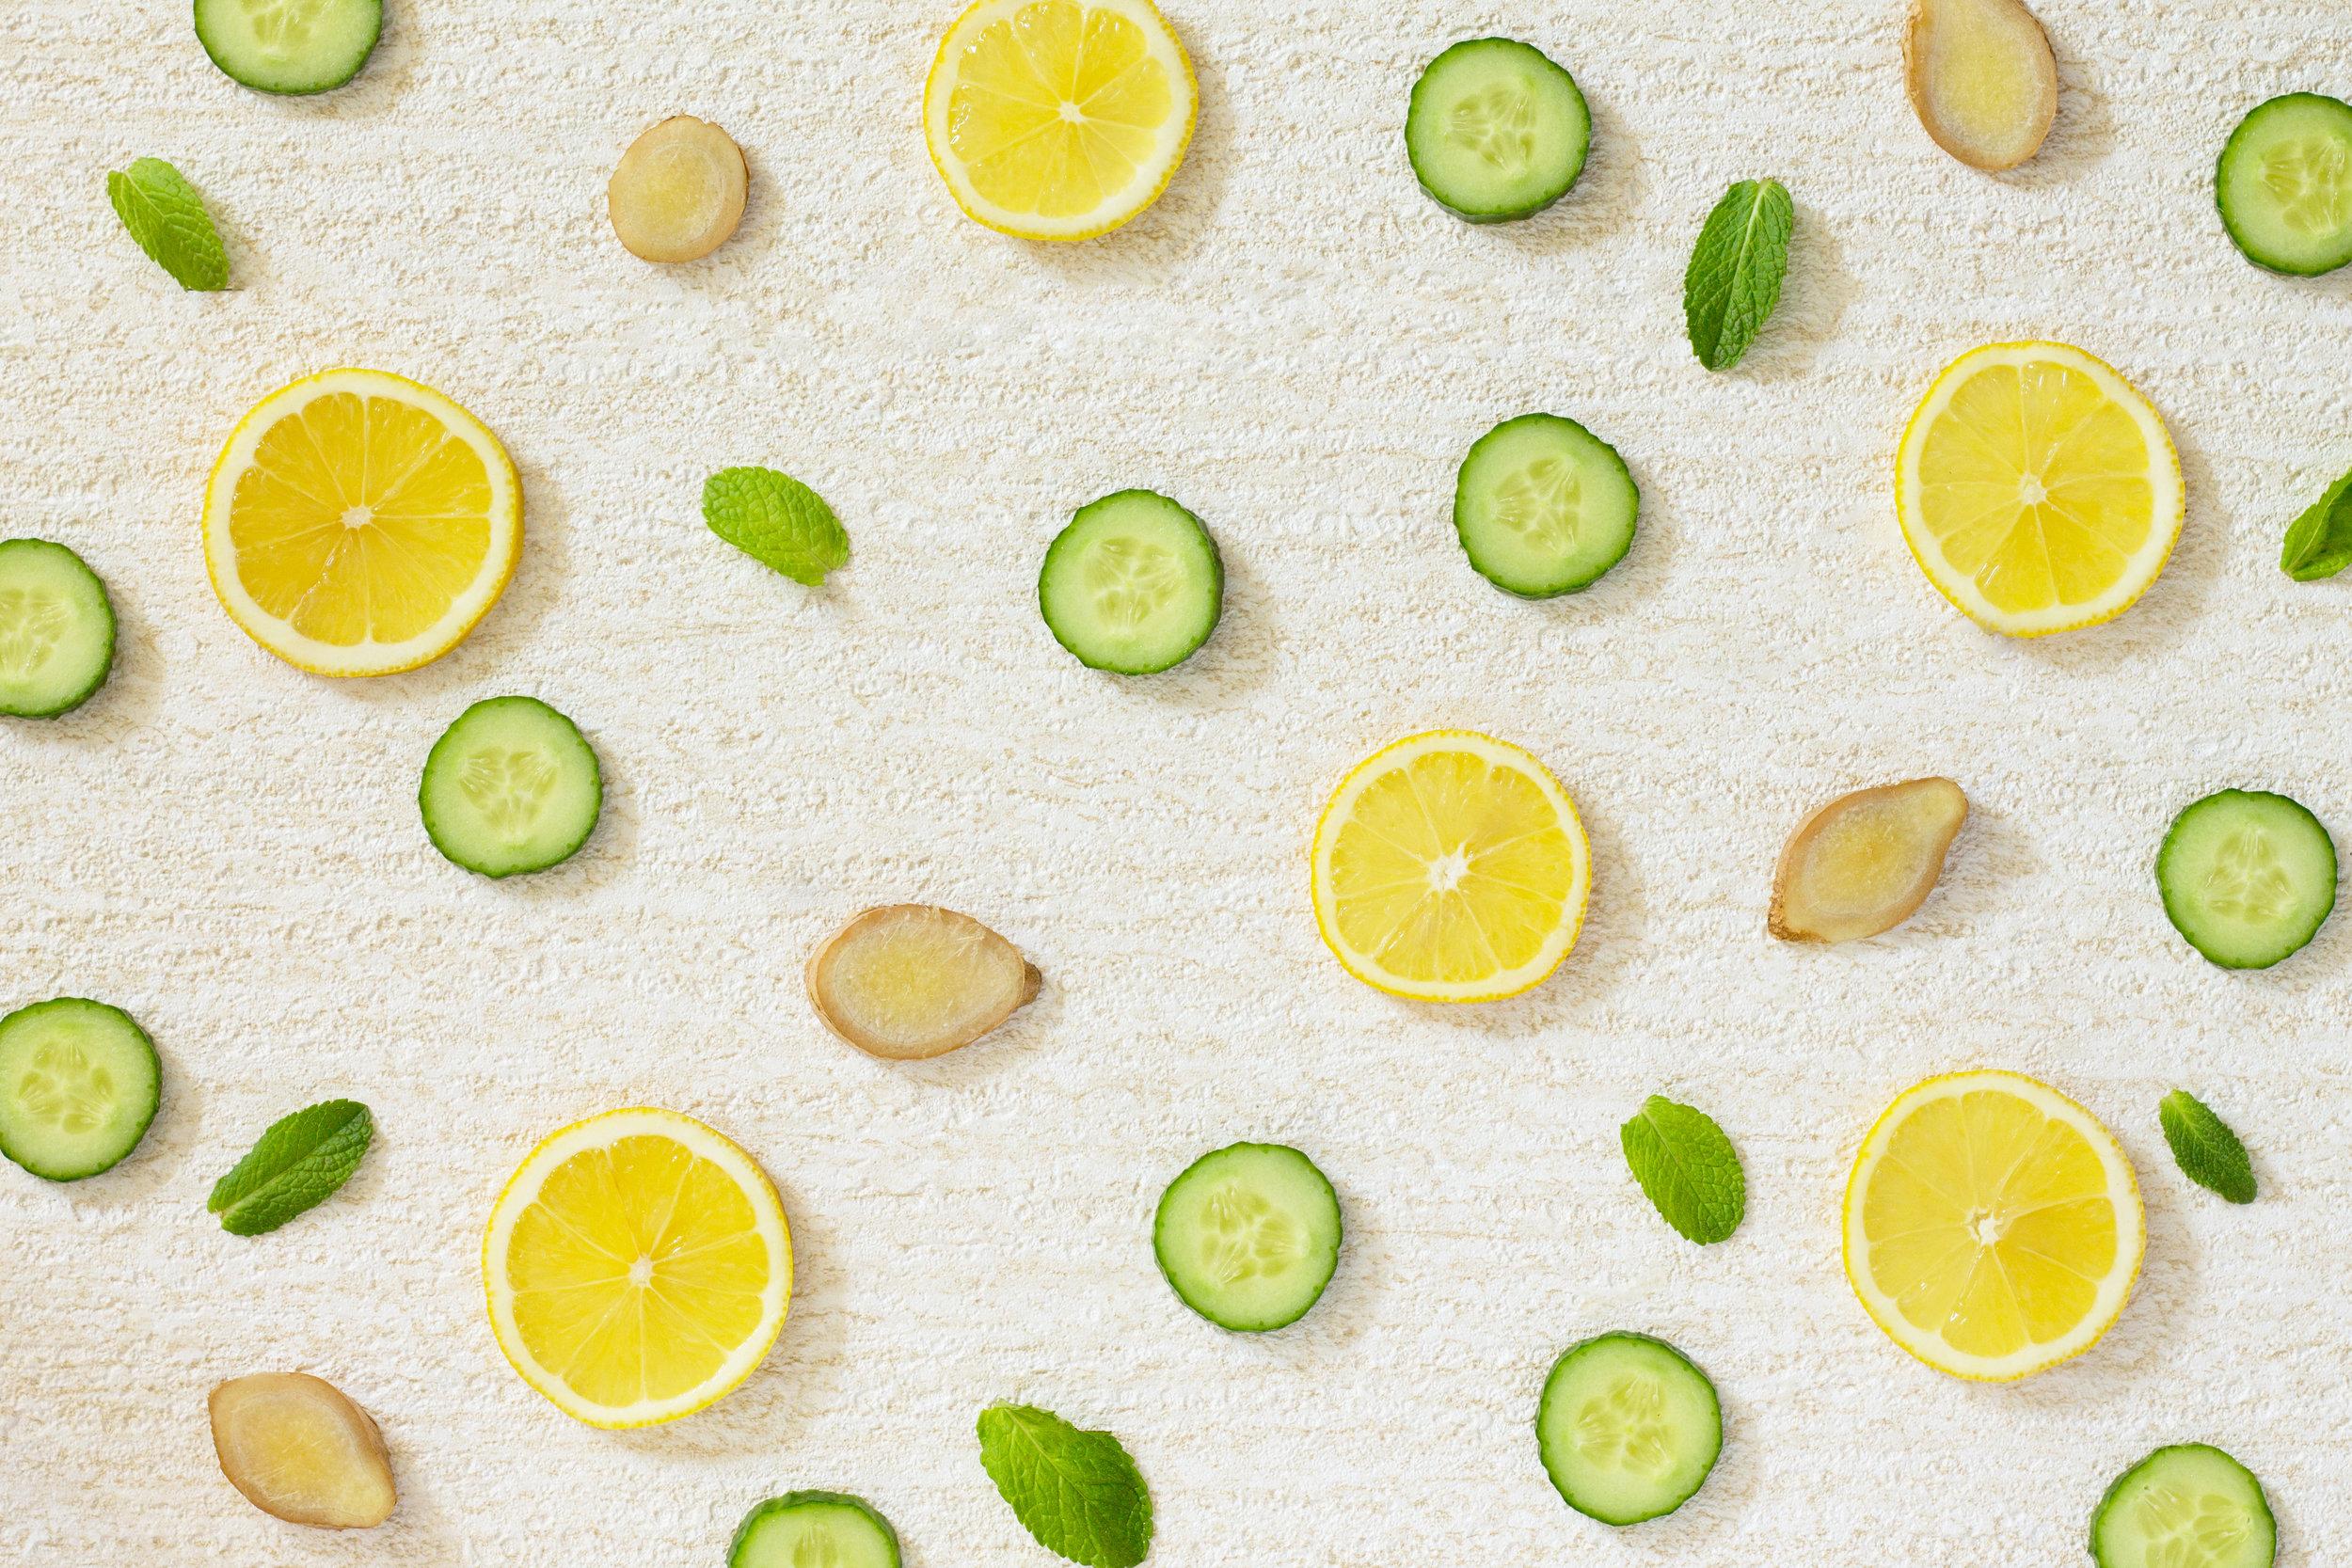 lemon_cuke_cleanse.jpg